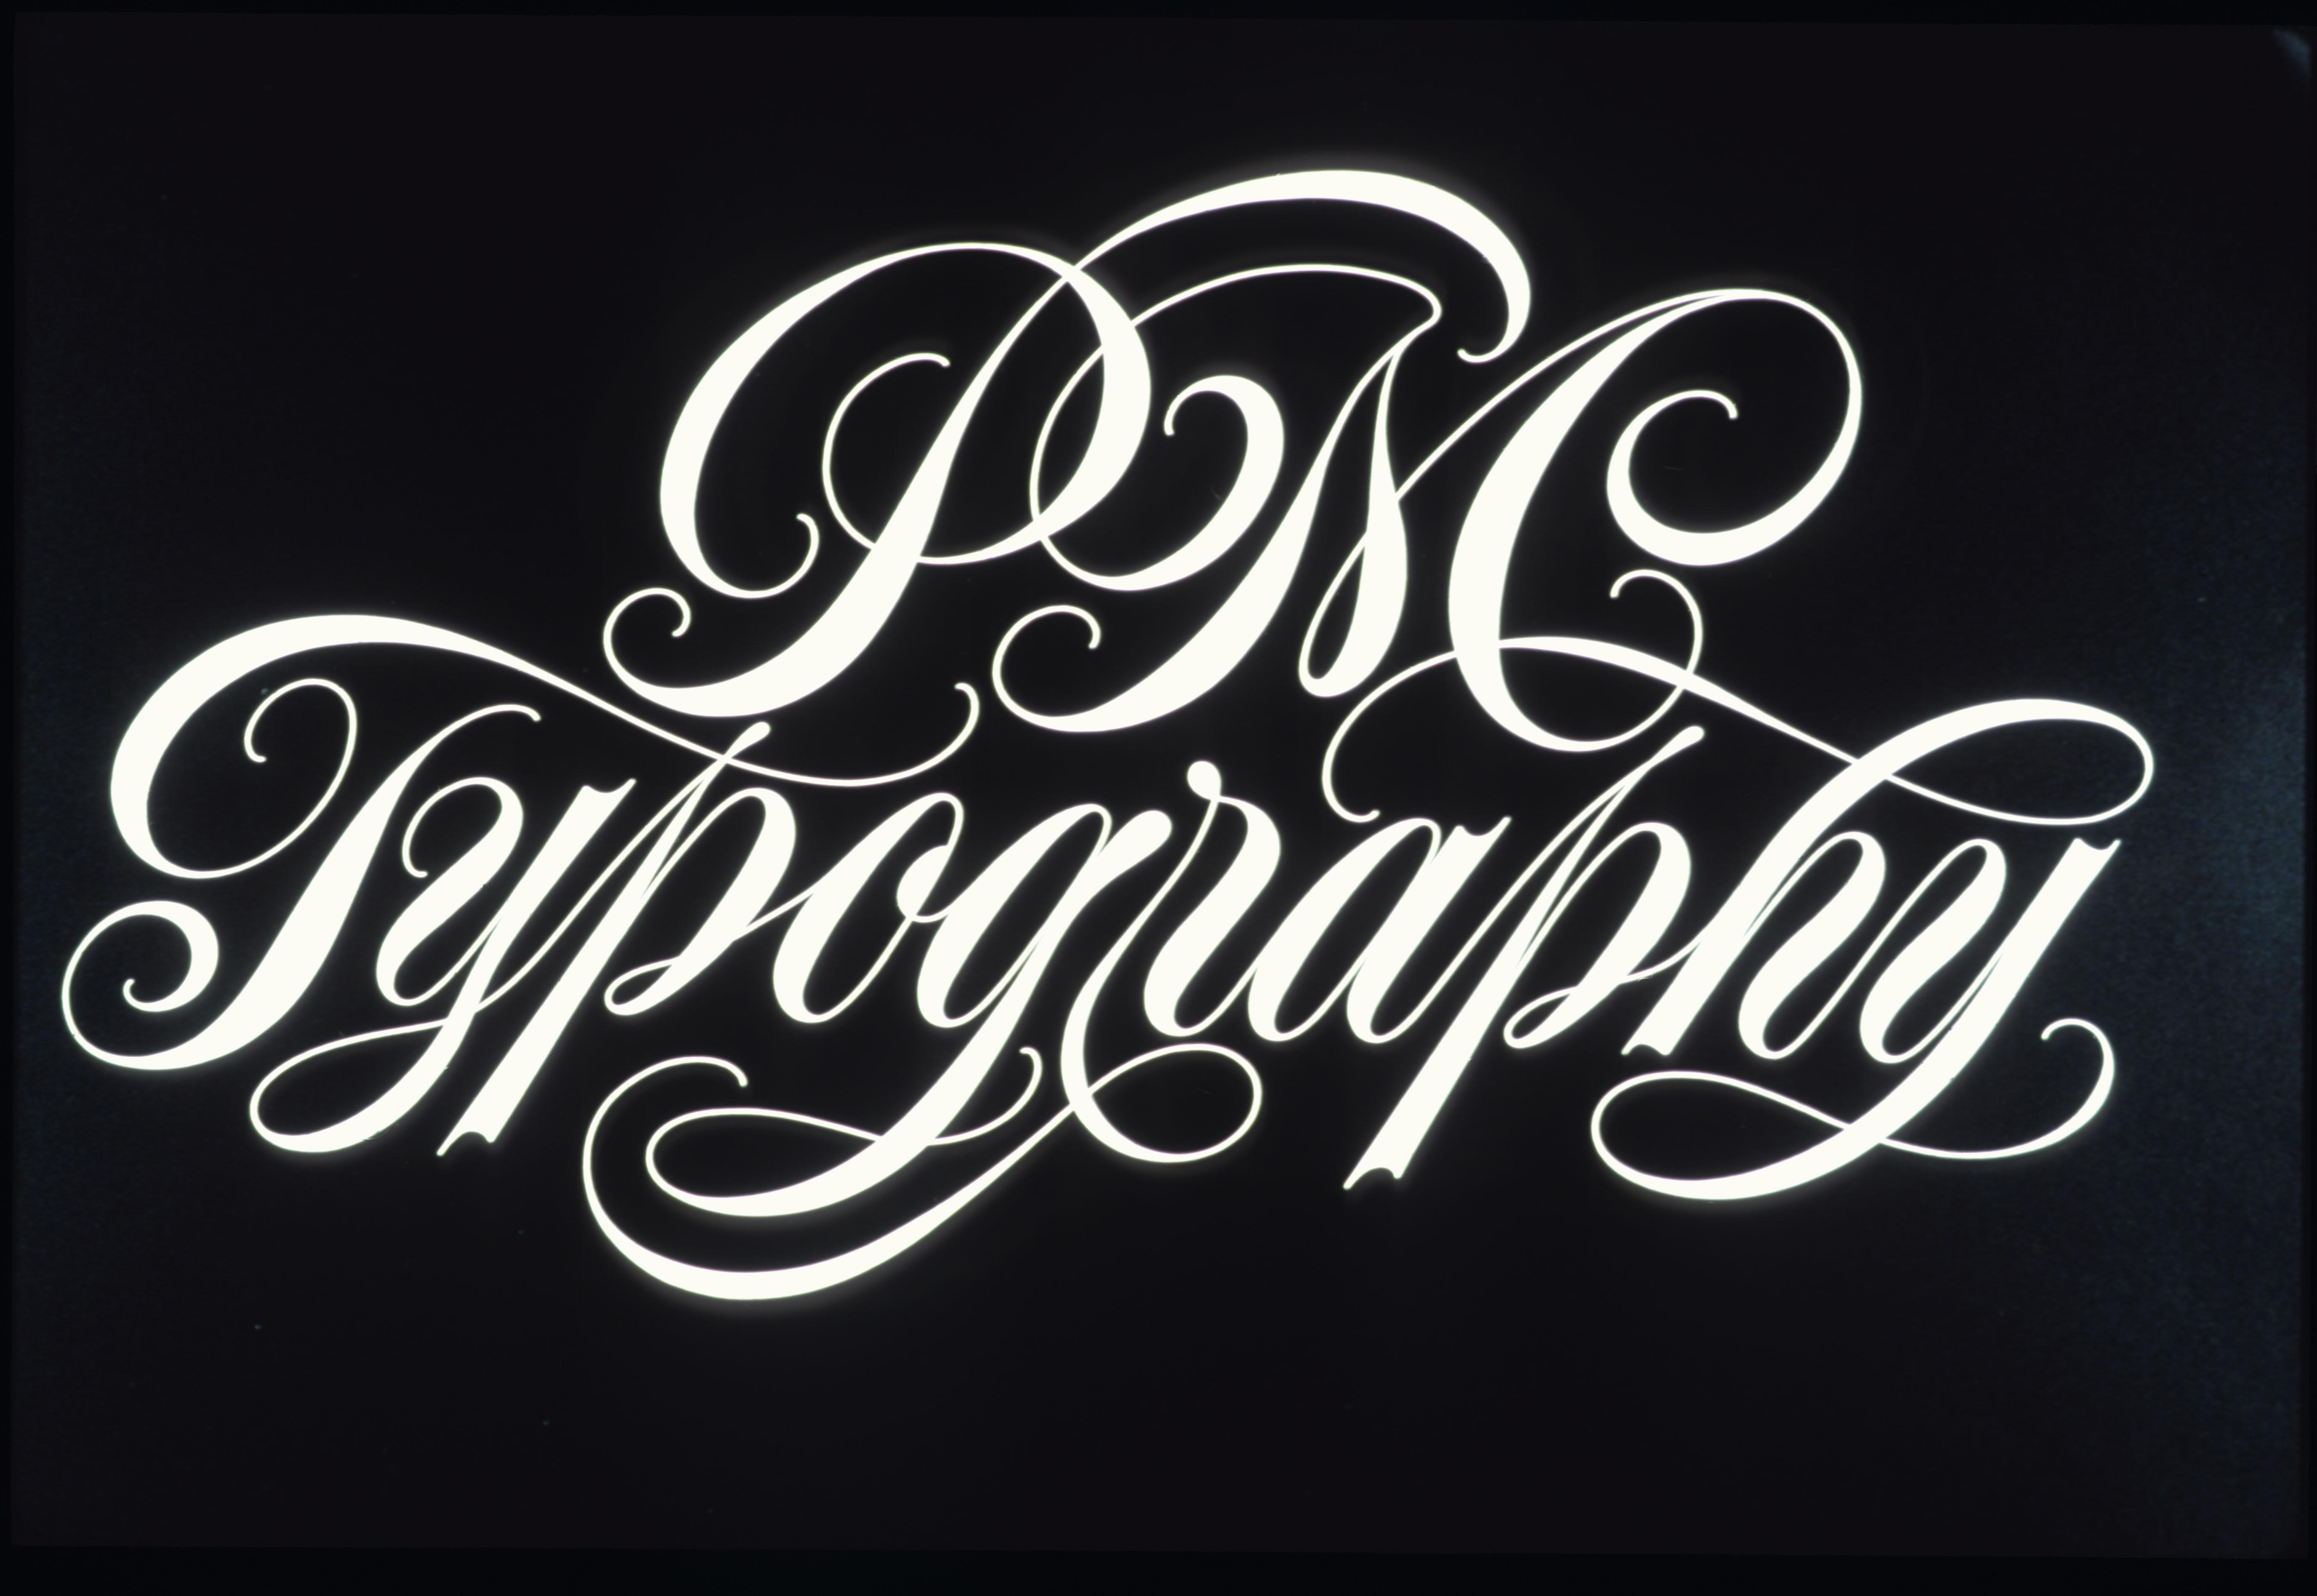 paul shaw letter design 187 gorey huerta and di spigna